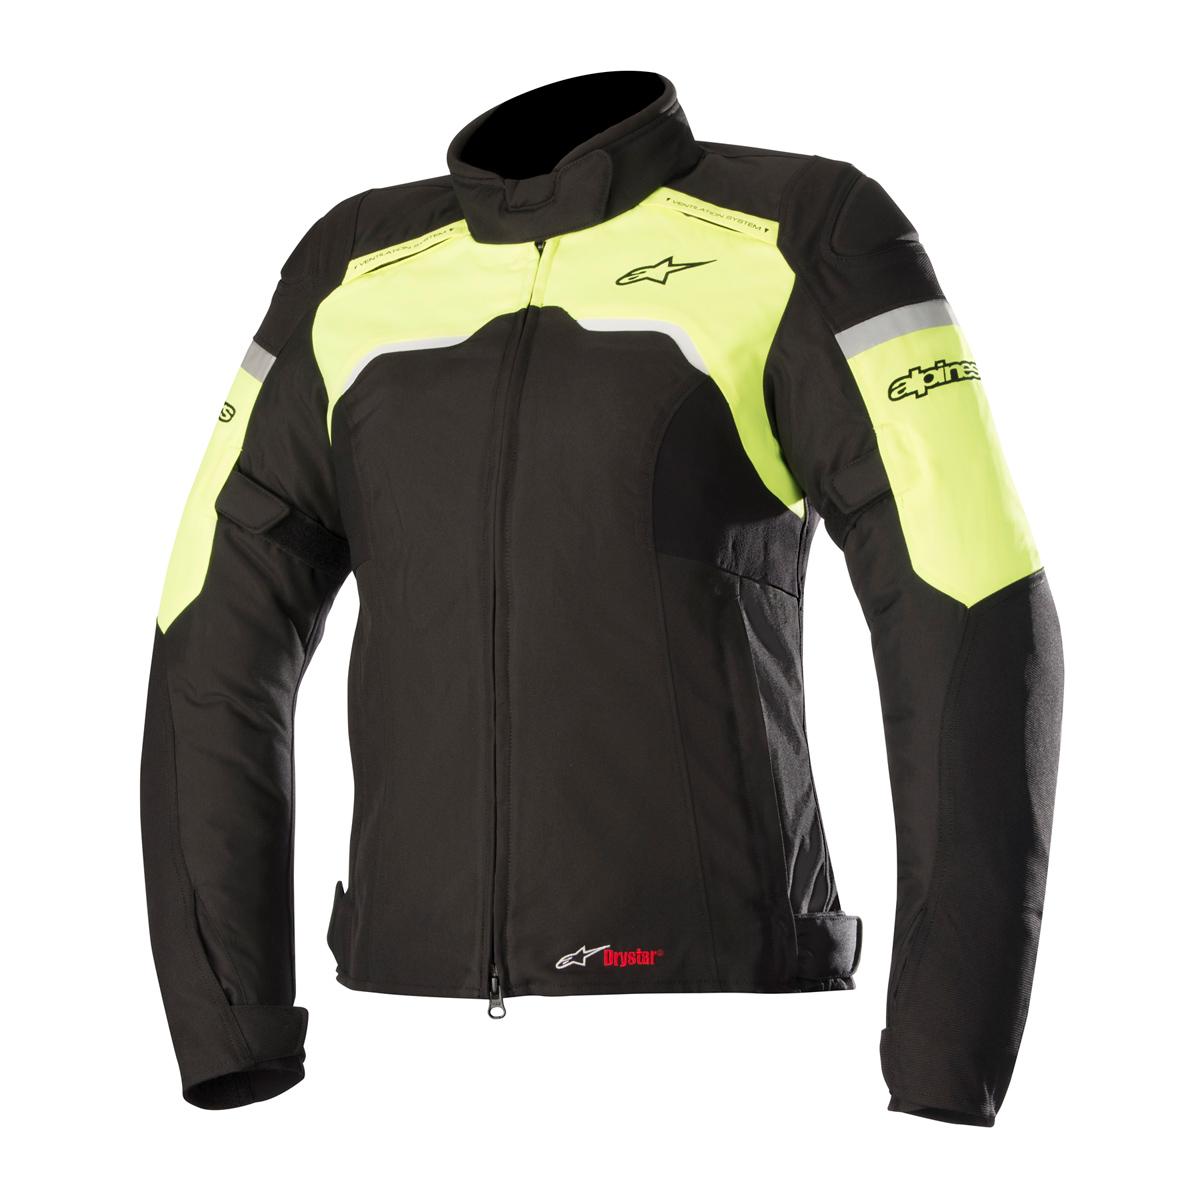 Alpinestars Women's Stella Hyper Drystar Black/Yellow Jacket